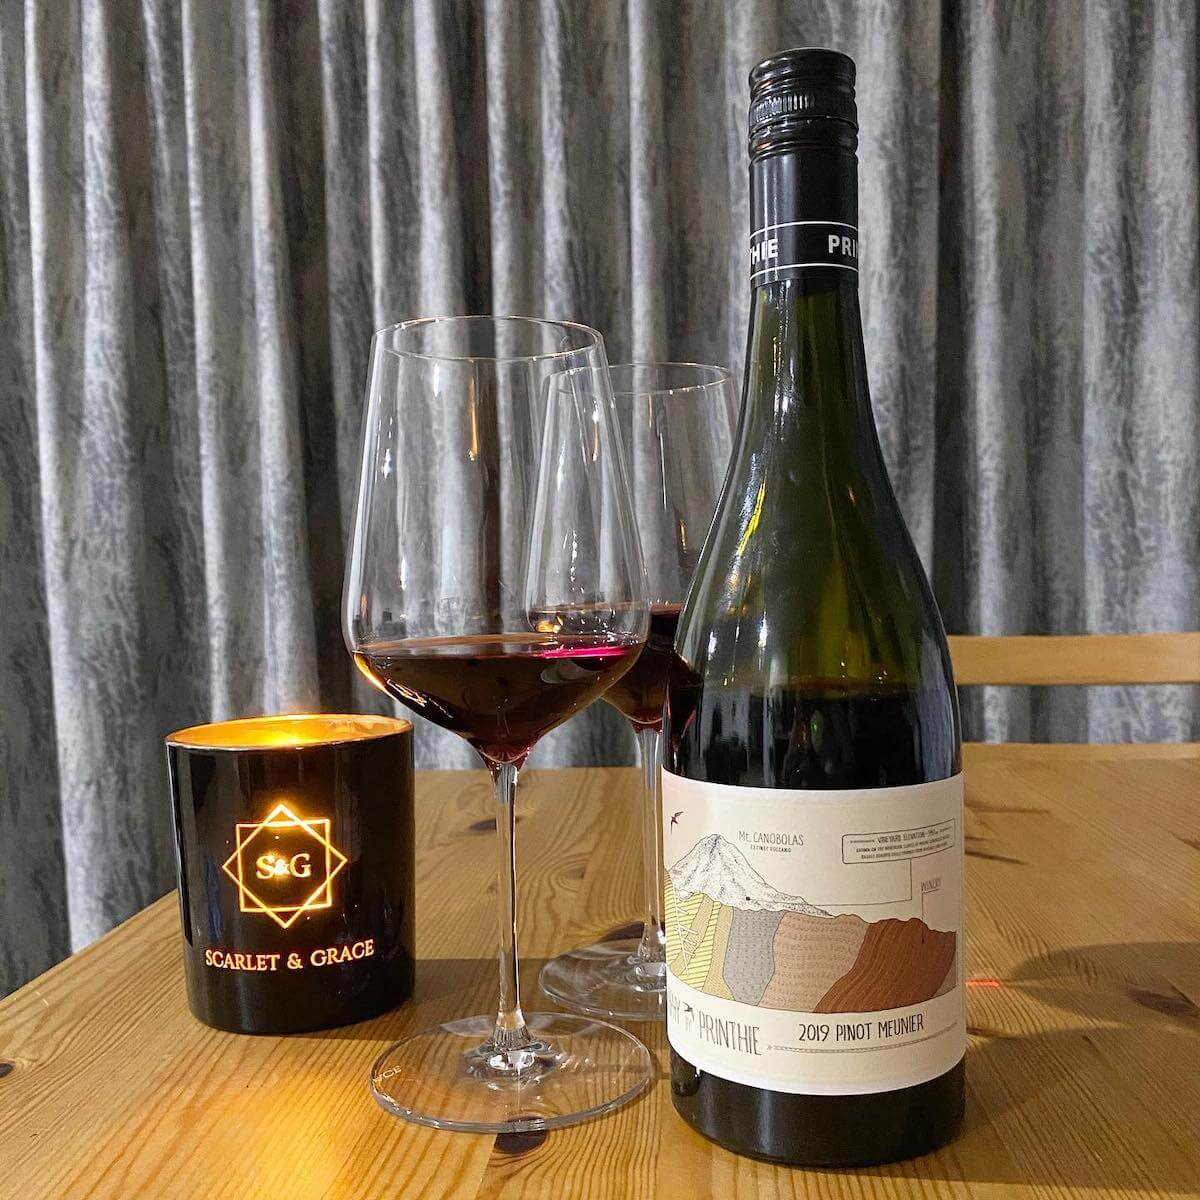 Printhie Wines 2019 Topography Pinot Meunier